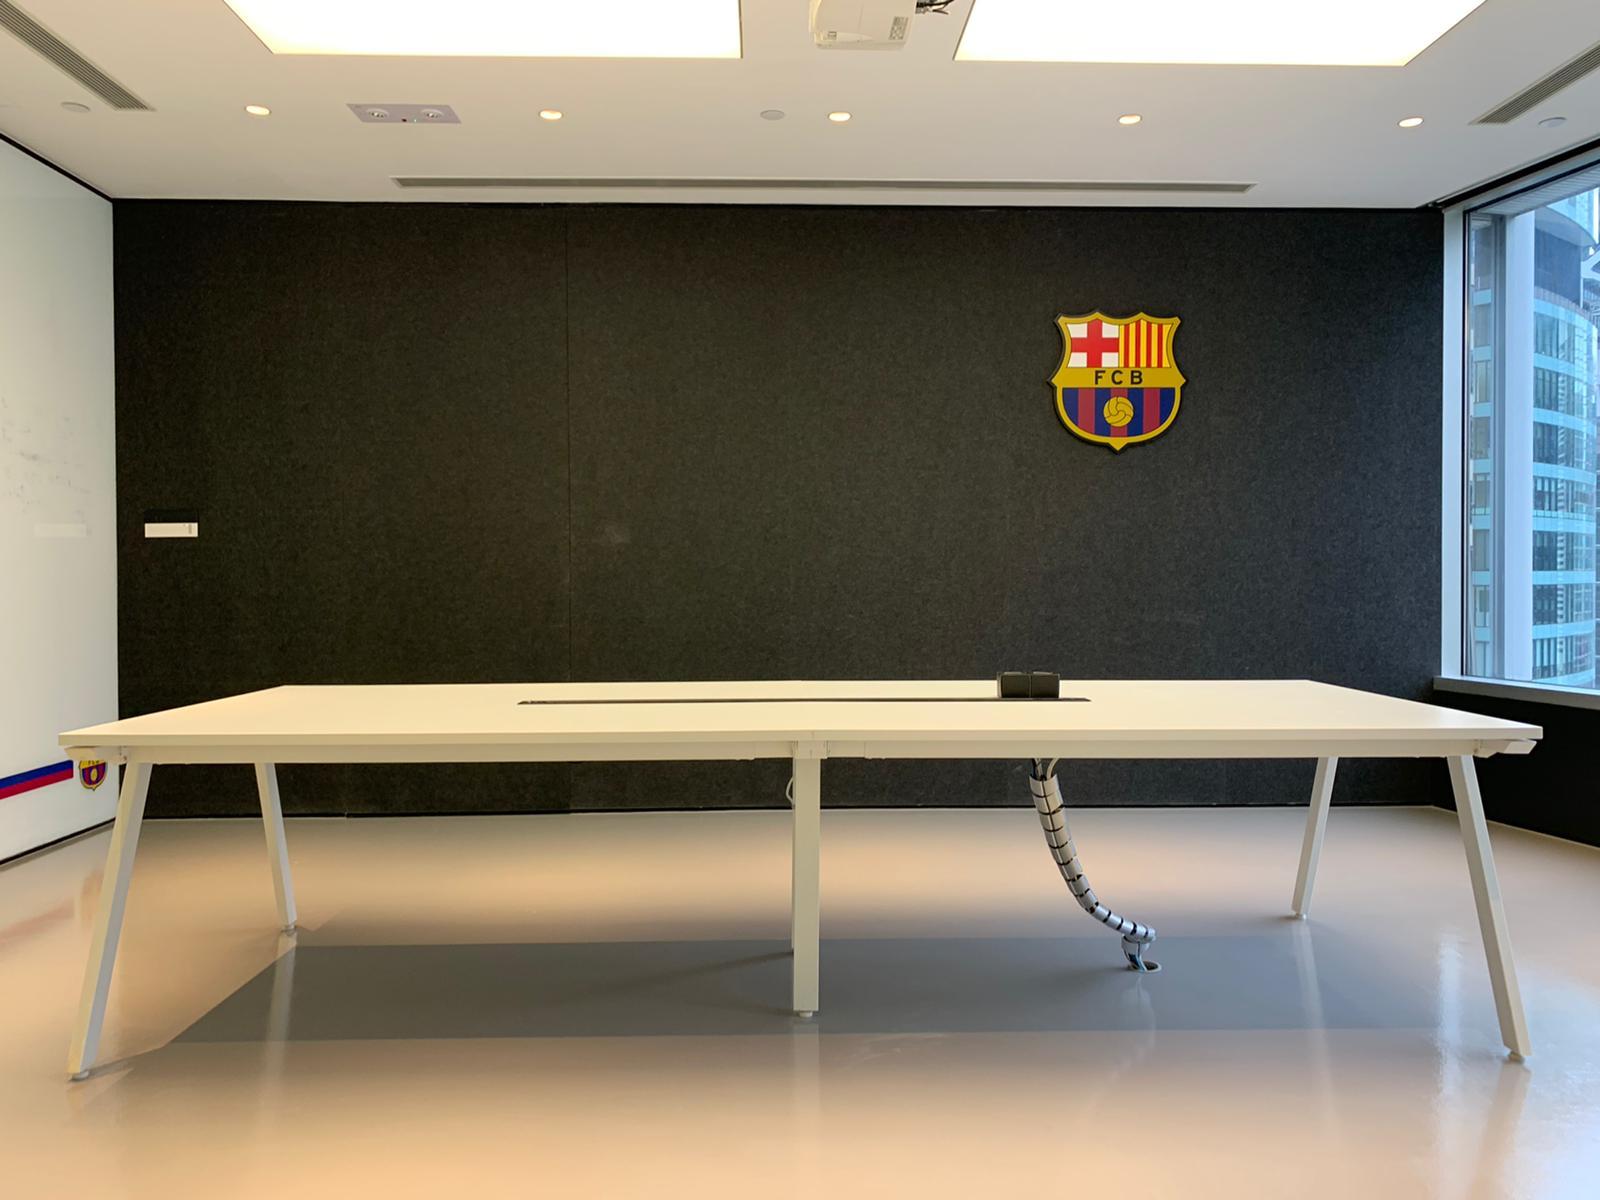 Football club barcelona office renovation hong kong